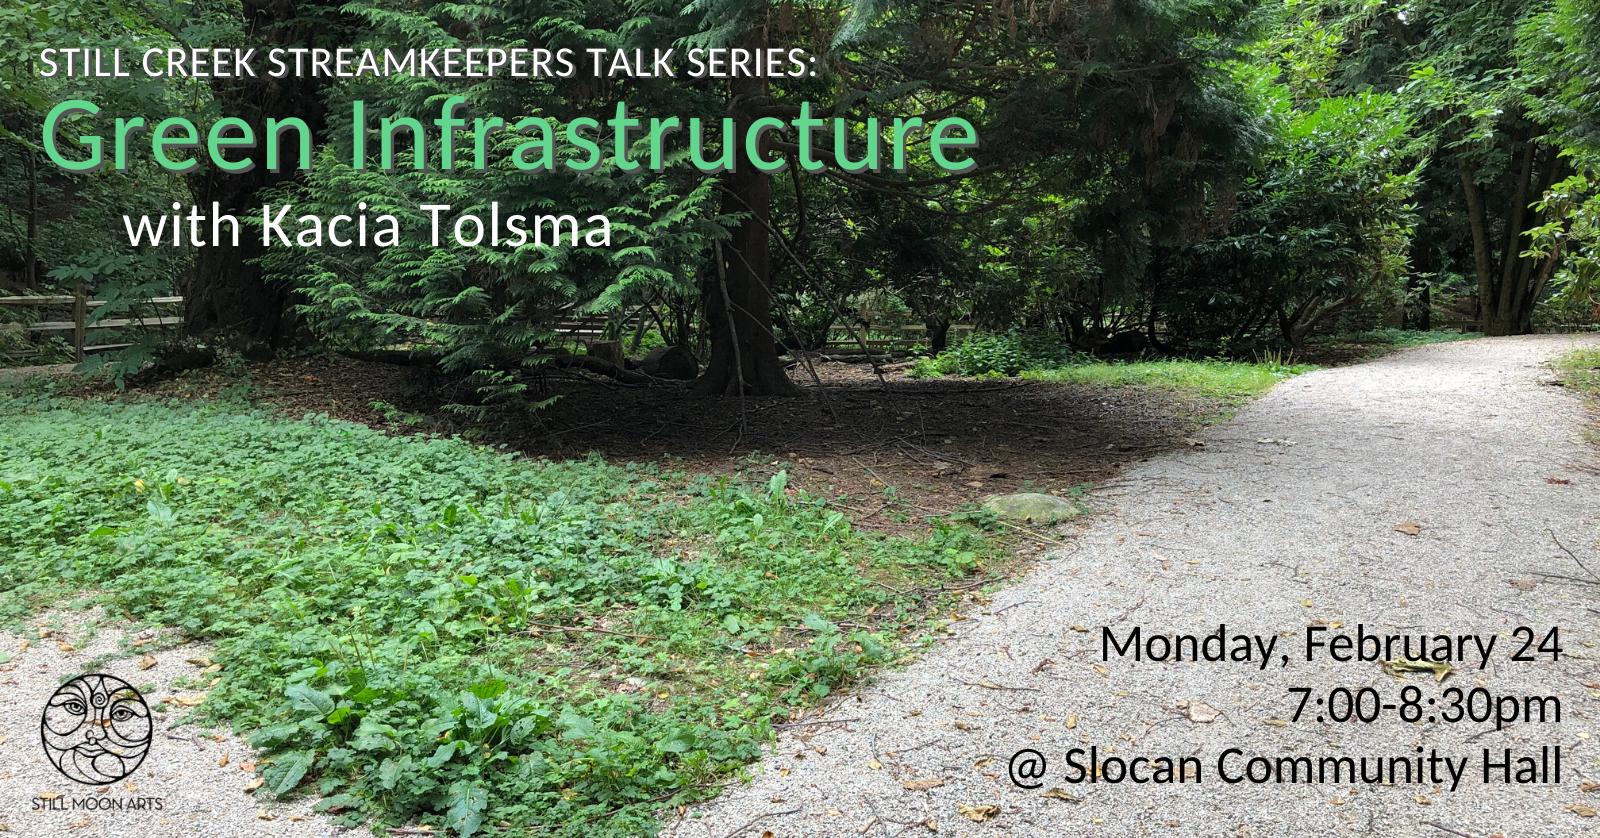 Green Infrastructure Talk with Kacia Tolsma